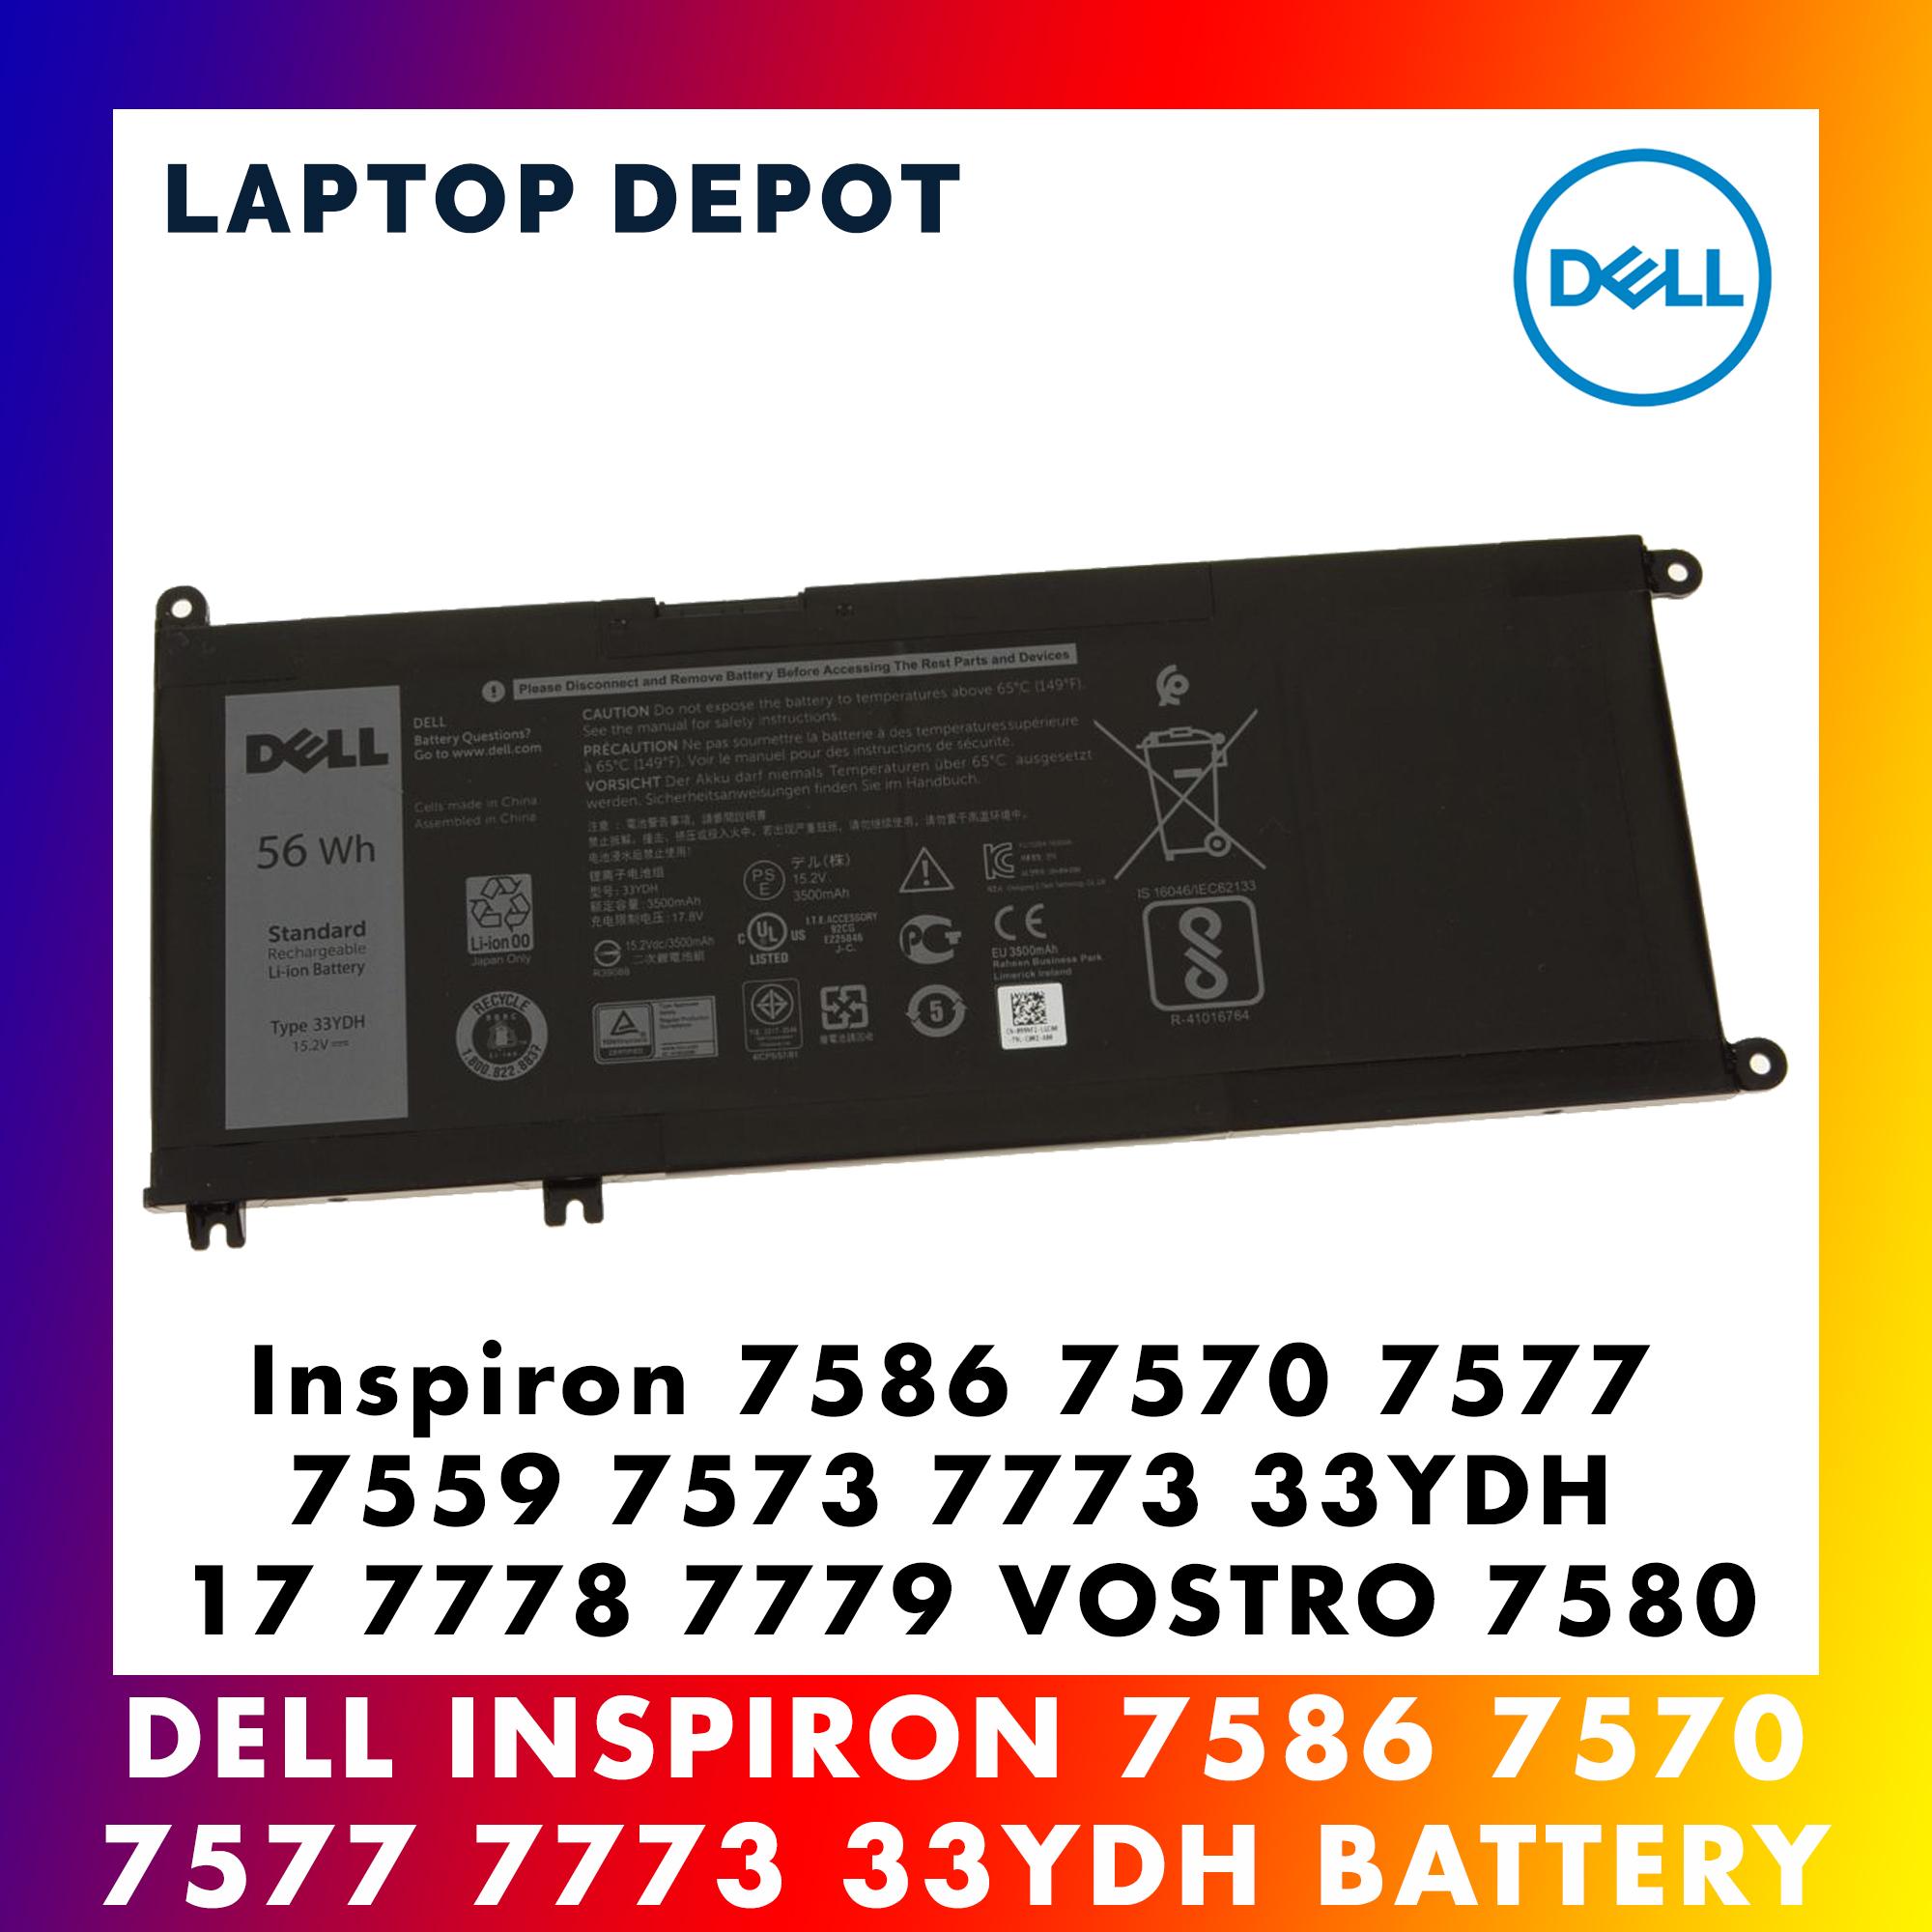 [100% Original] Dell Inspiron 17 7778 7779 7586 7570 7577 7559 Battery